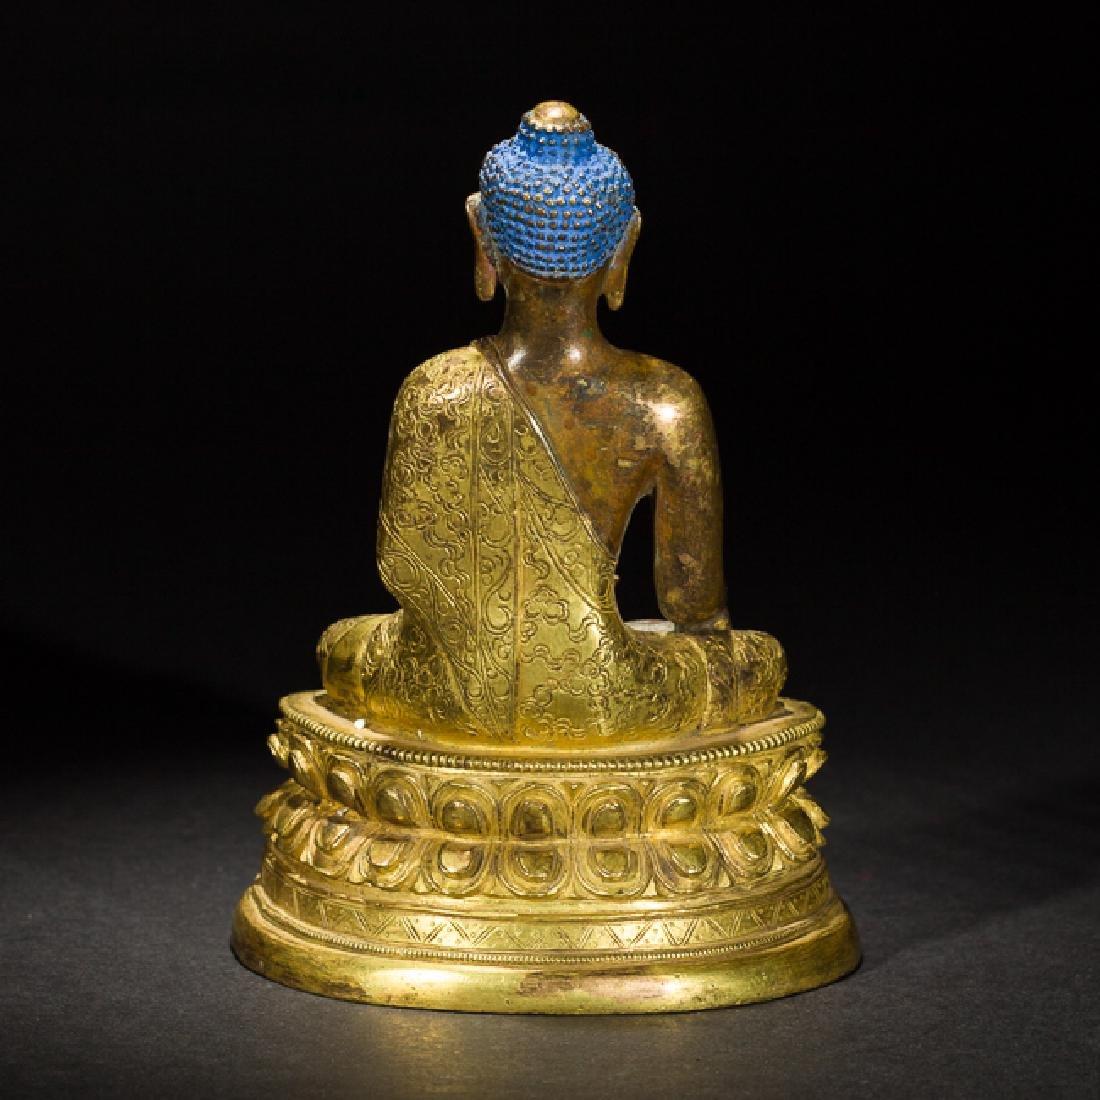 Antique Gilt Bronze Figure of Shakyamuni Buddha, 18th - 3